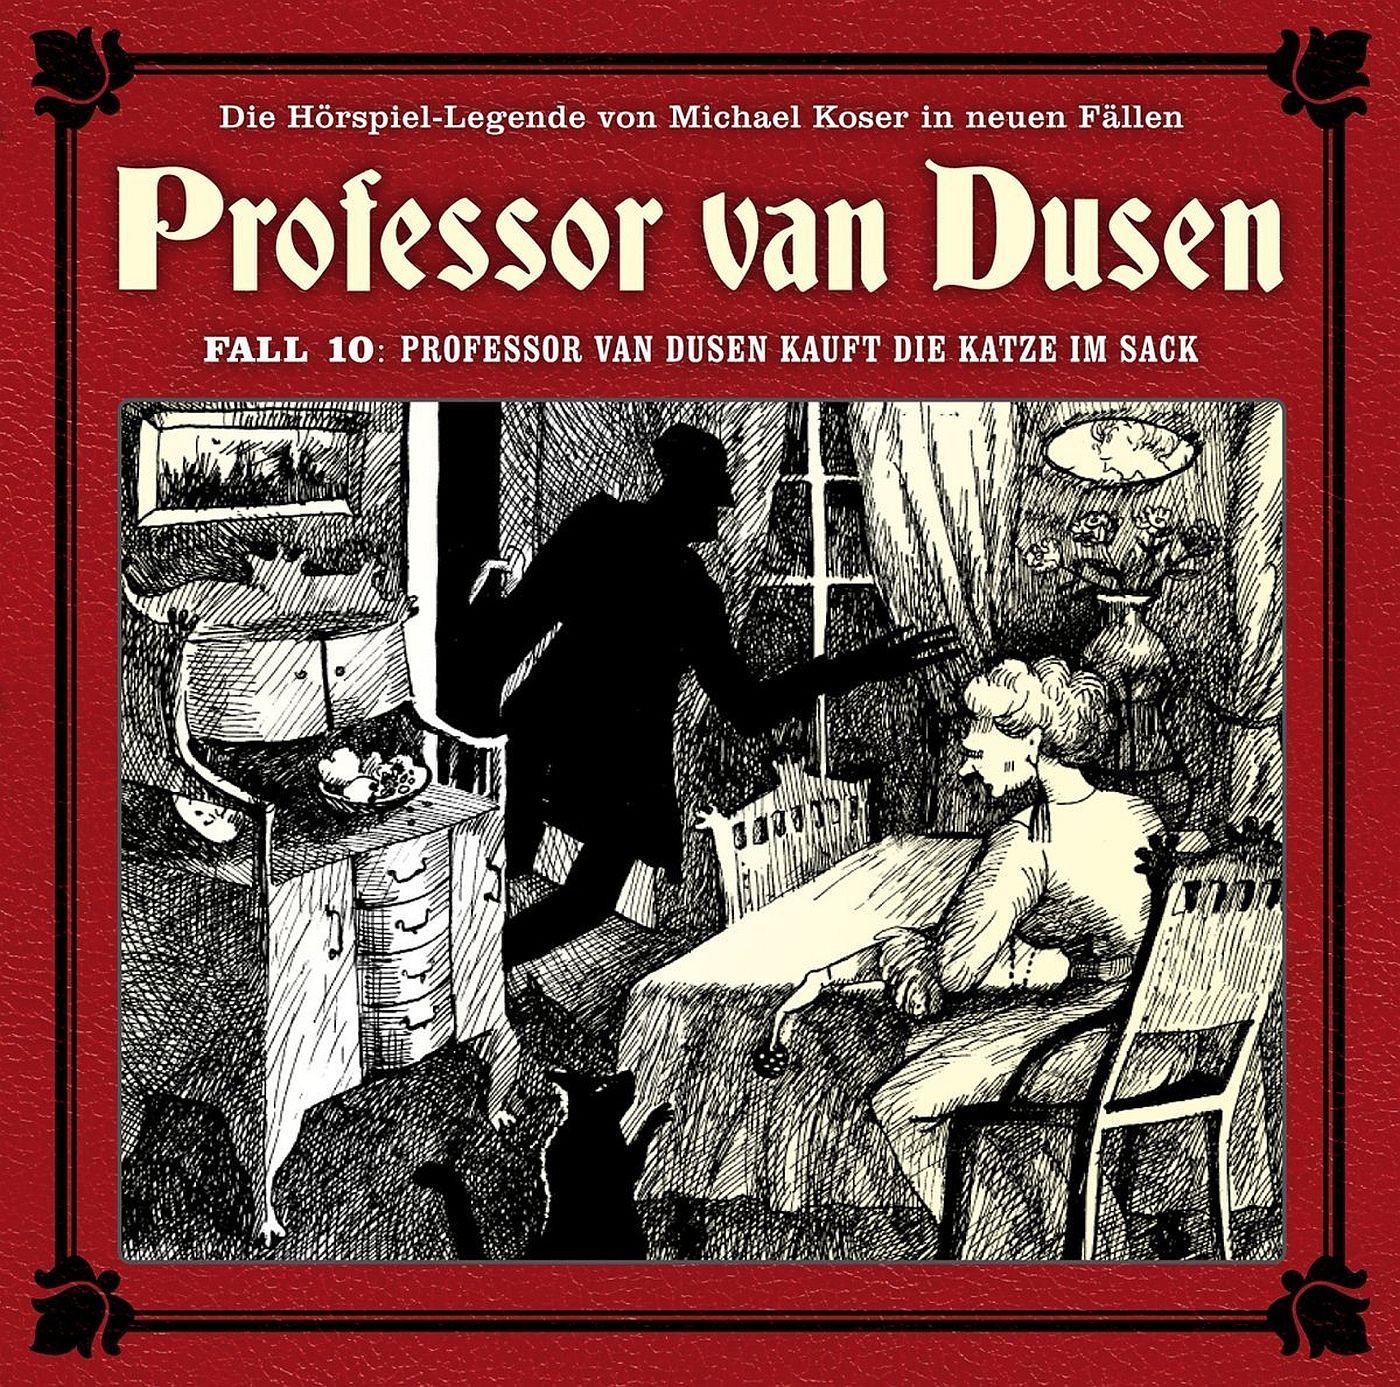 Professor van Dusen - Neue Fälle 10: Professor van Dusen kauft die Katze im Sack